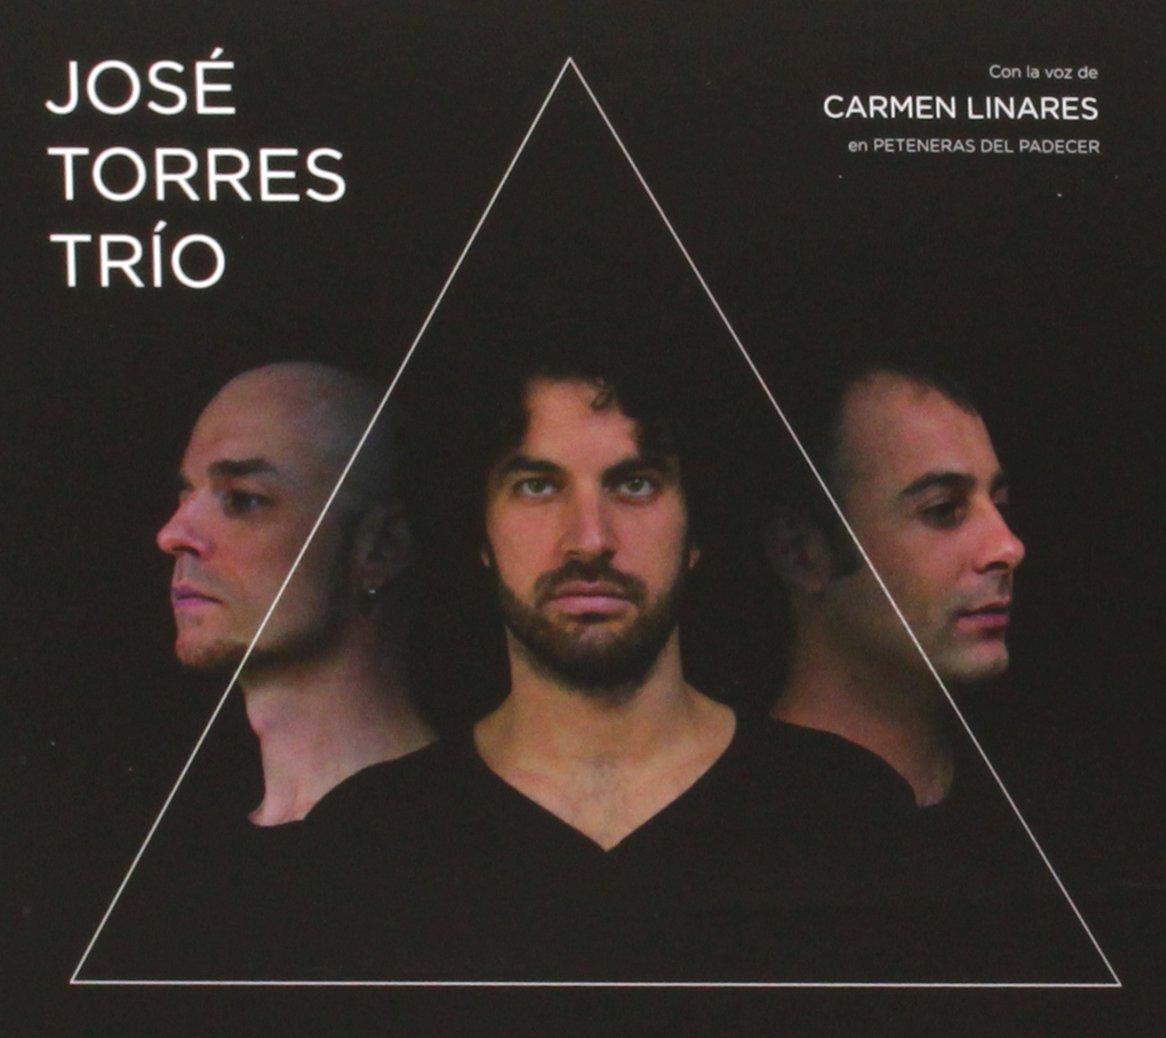 Jose Torres Trio: Jose Torres Trio: Amazon.es: Música